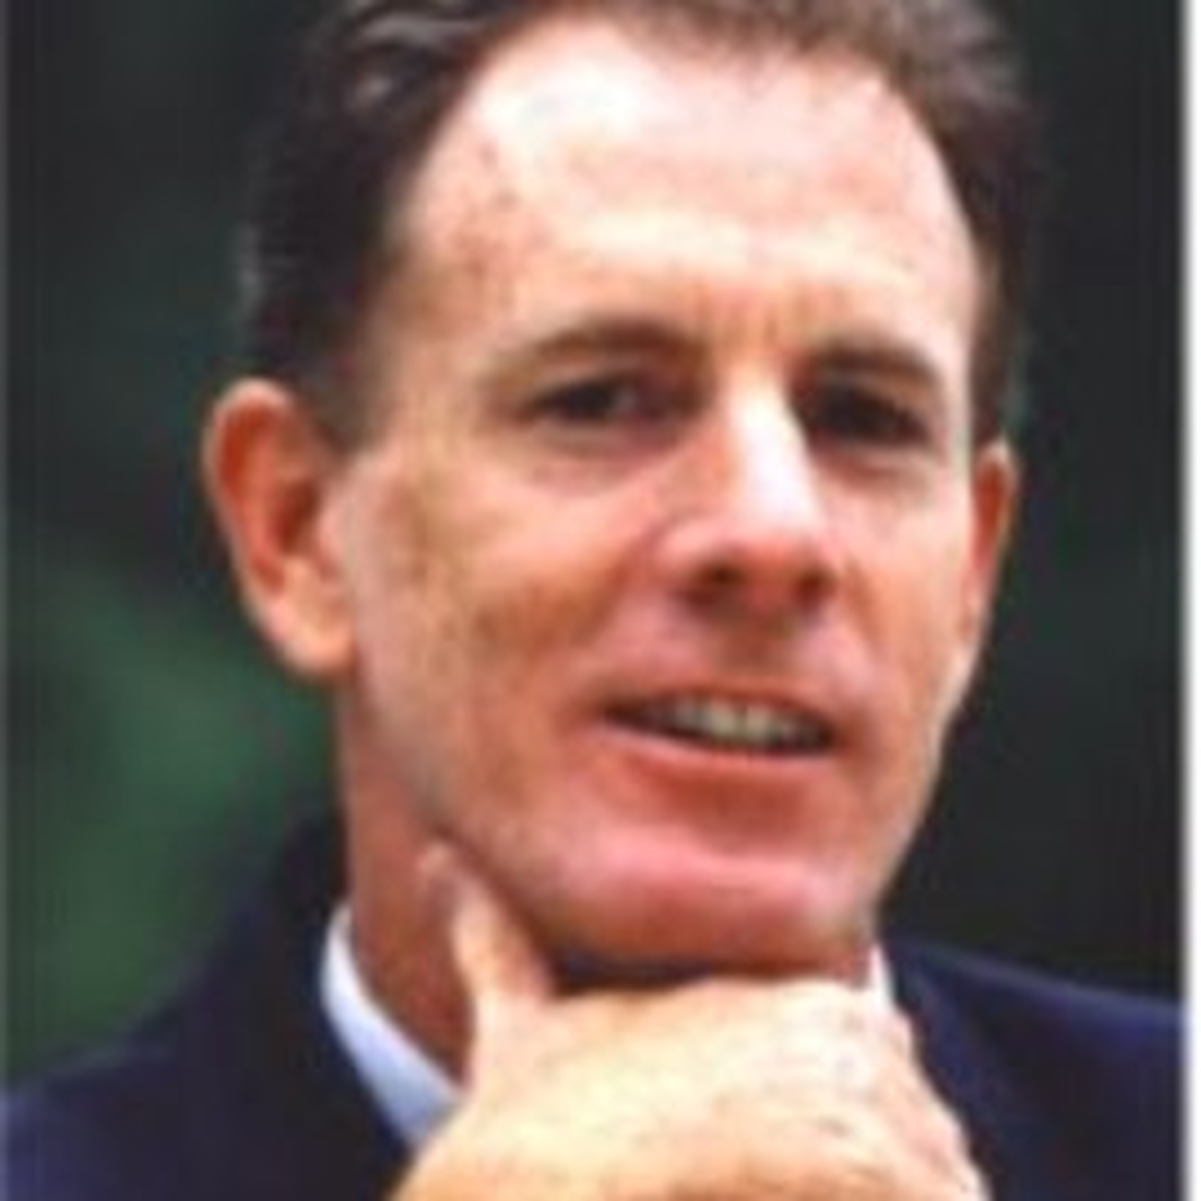 William Knoke